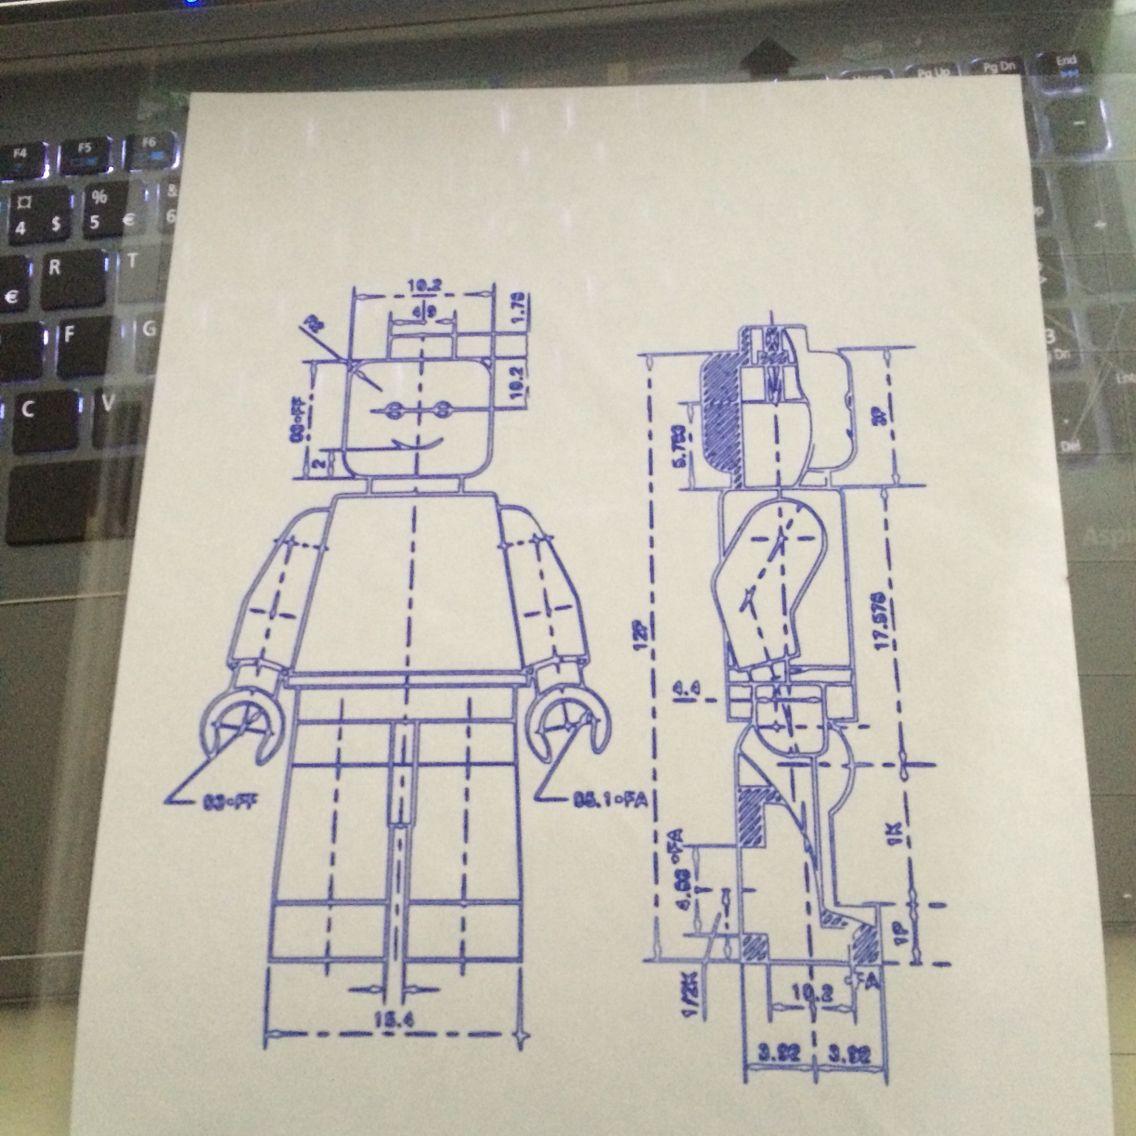 Printed with silhouette cameo lego blueprint blueprints pinterest printed with silhouette cameo lego blueprint malvernweather Choice Image